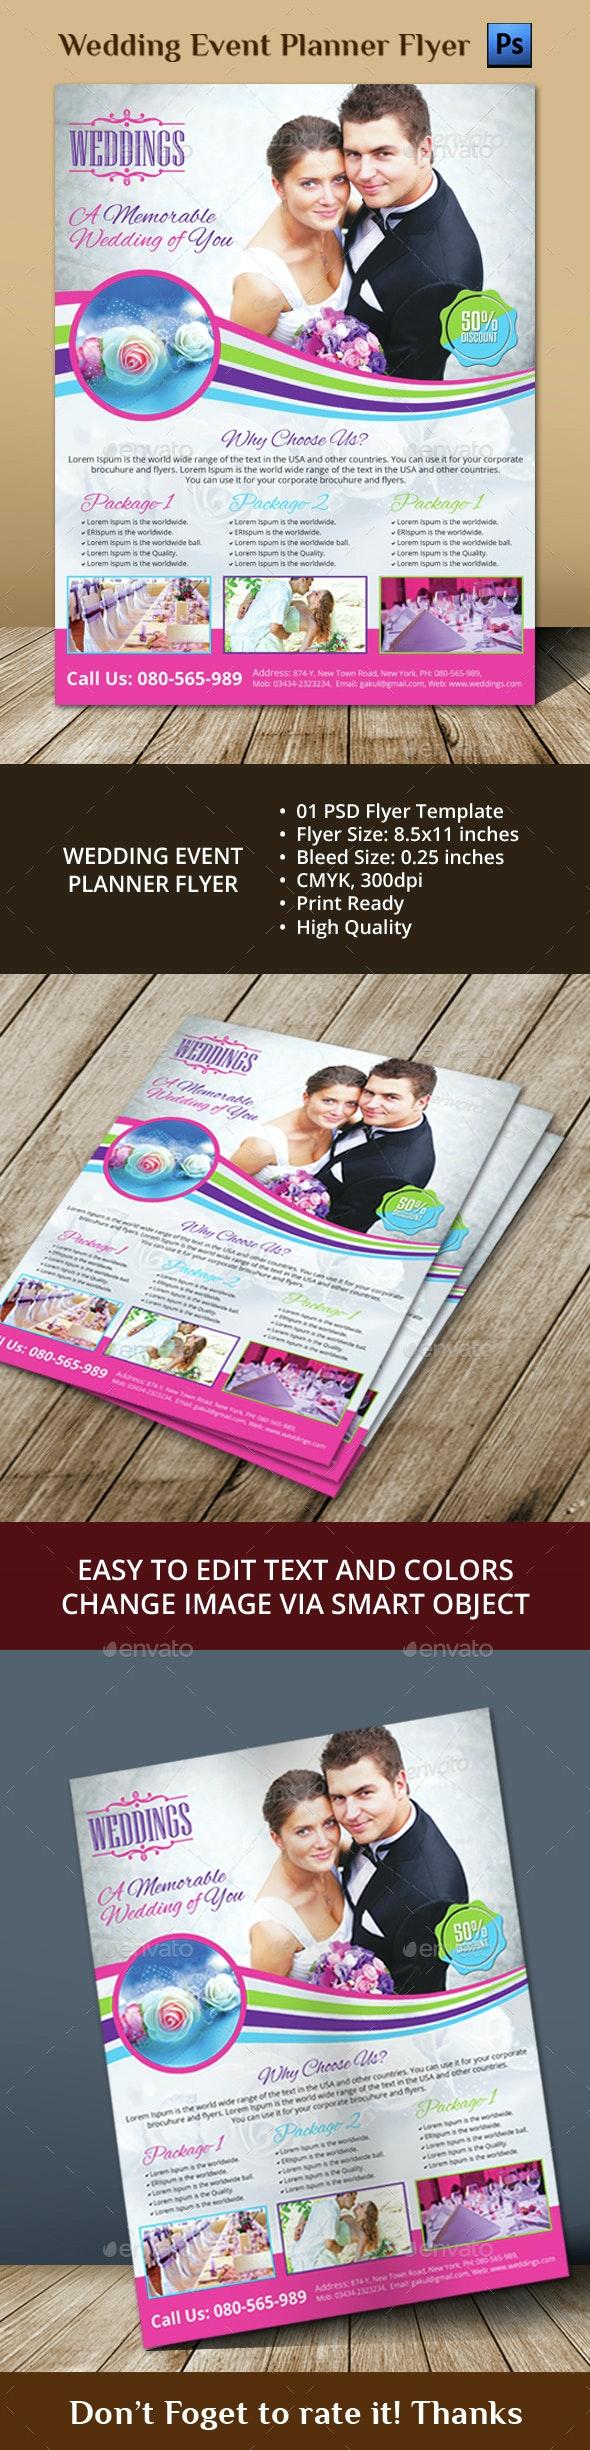 Wedding Event Planner Flyer - Events Flyers